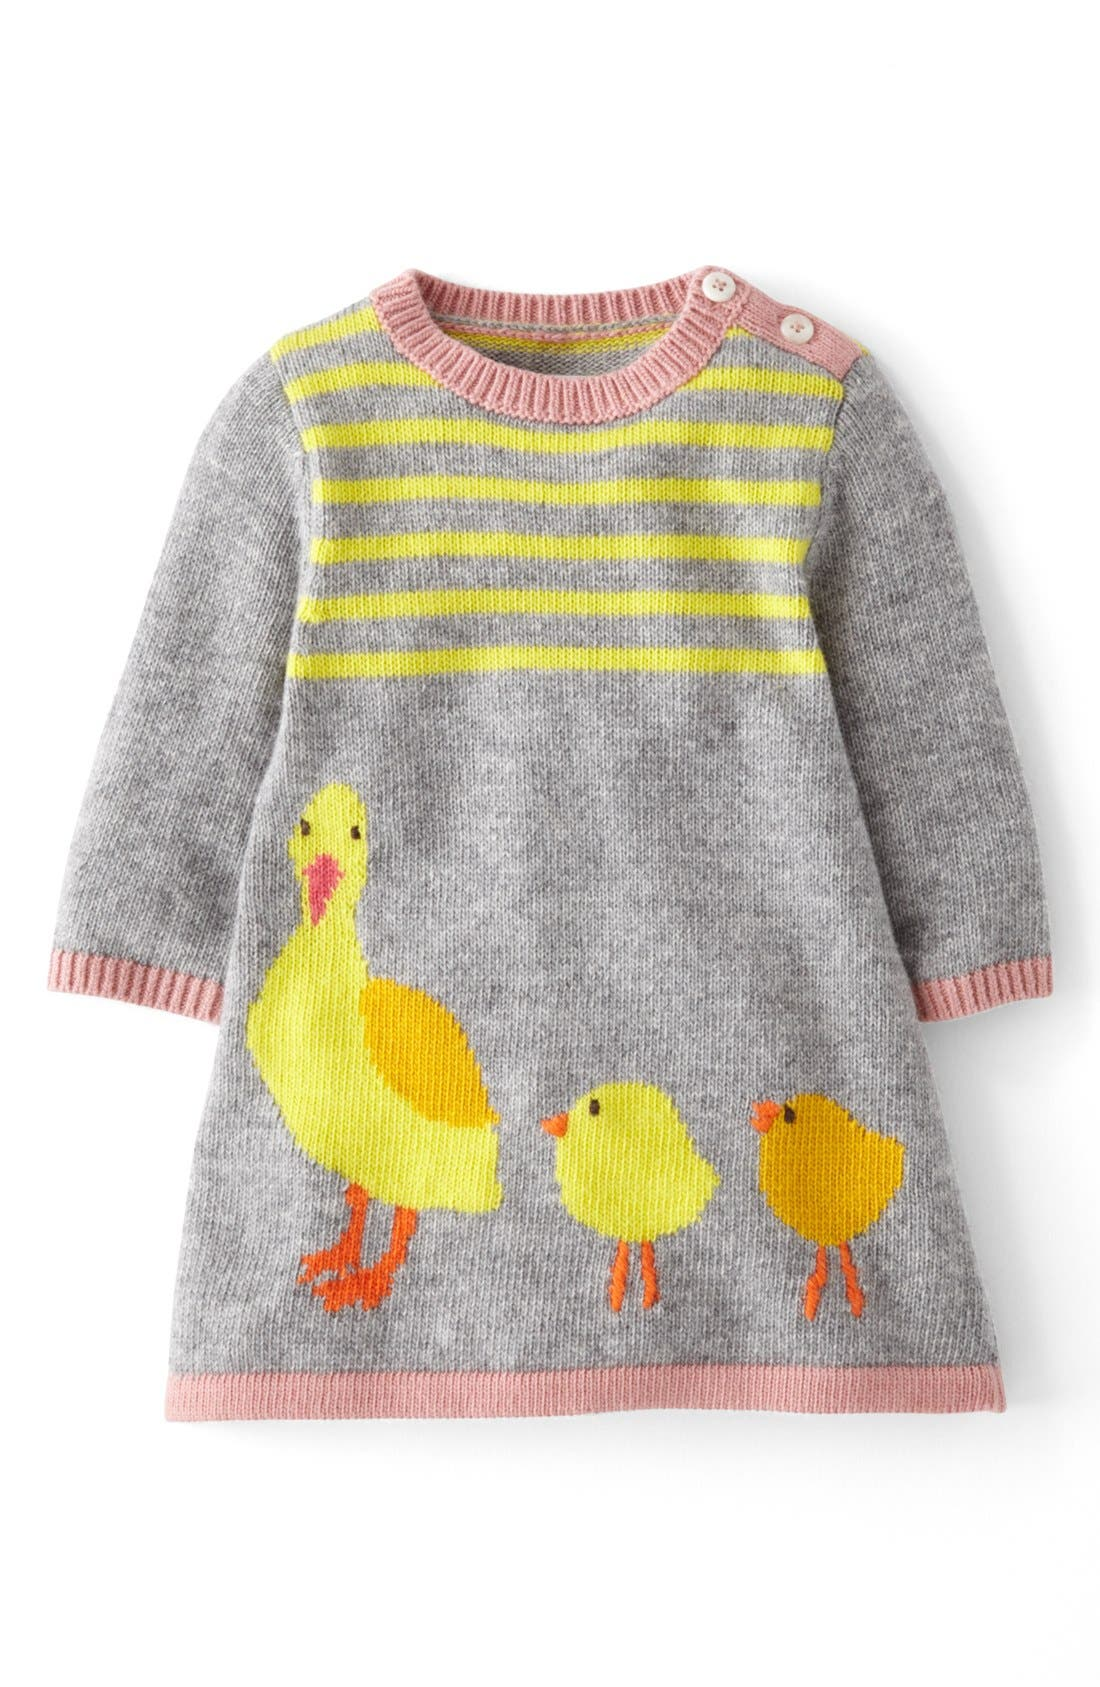 Main Image - Mini Boden 'My Baby' Knit Dress (Baby Girls)